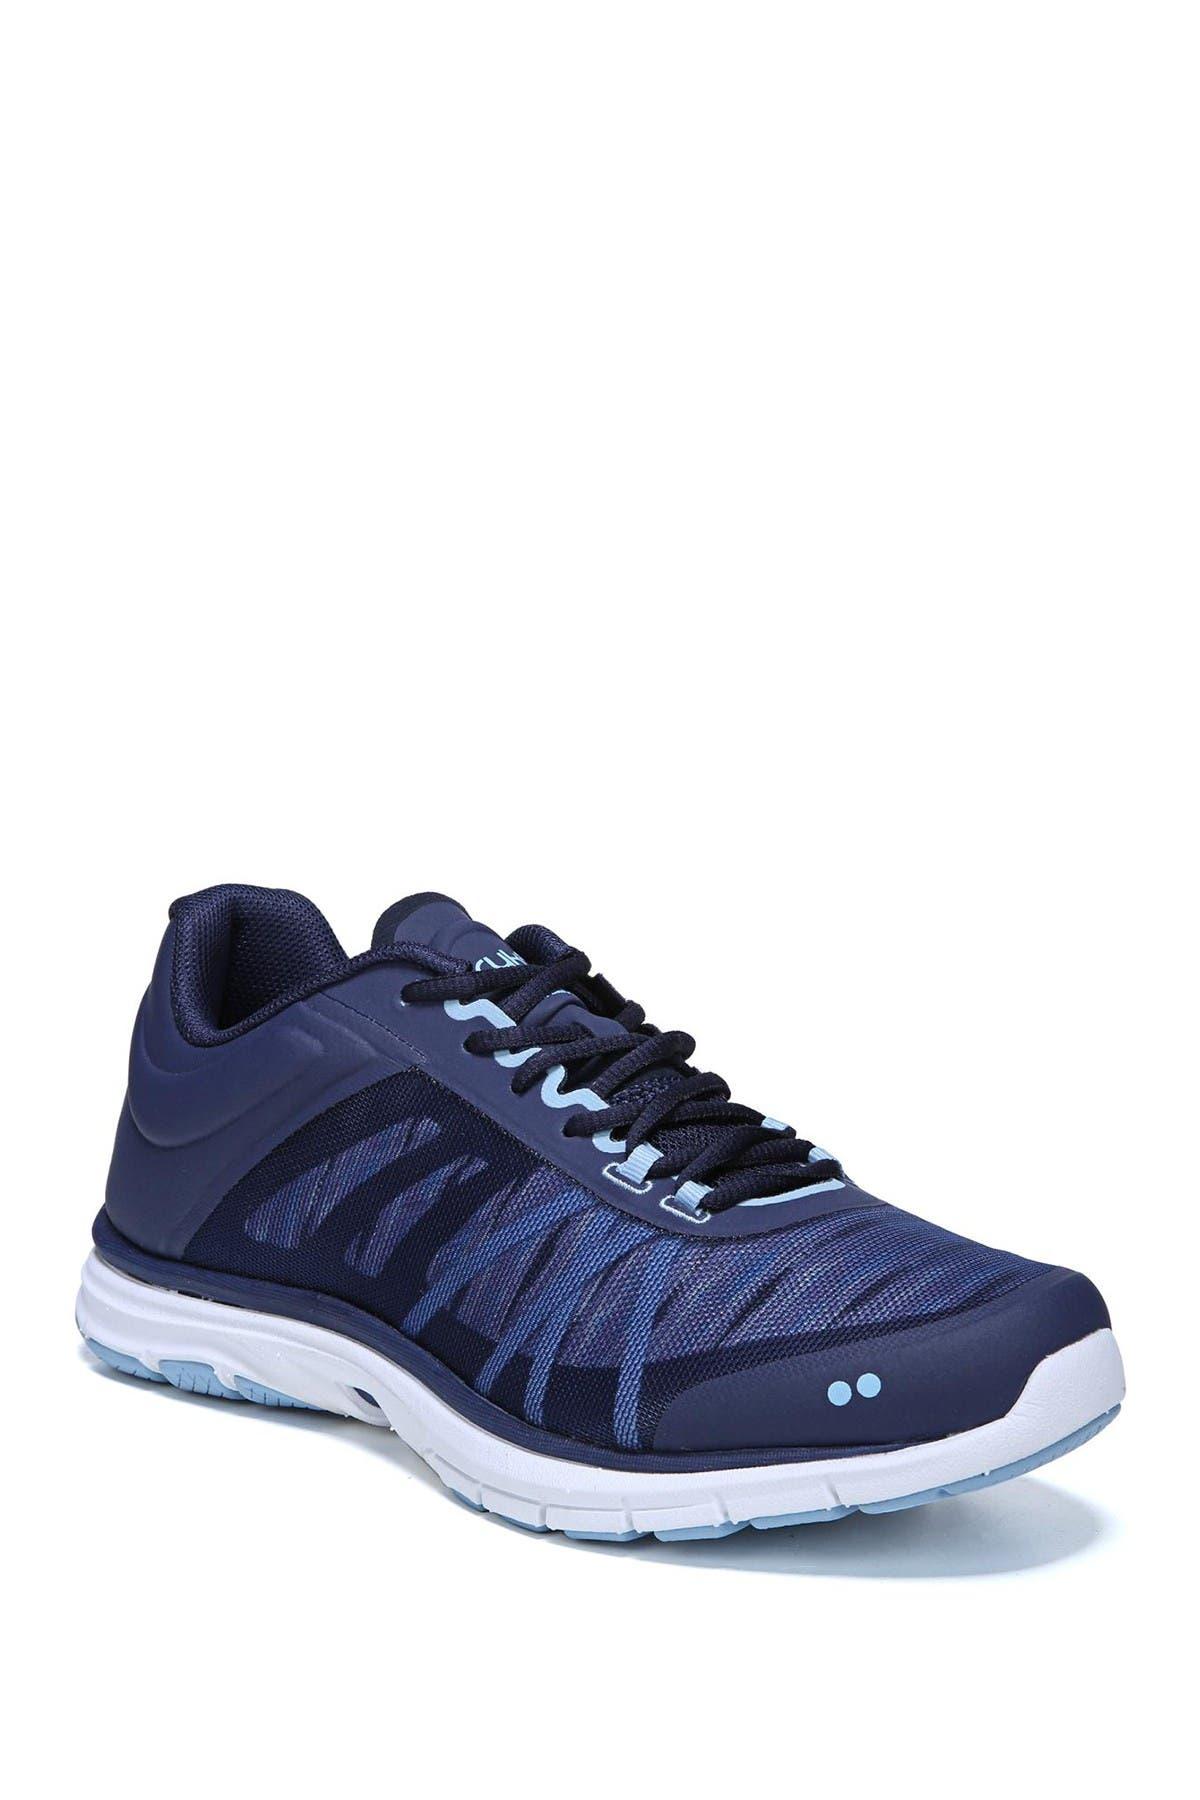 Ryka | Dynamic 2.5 Sneaker | Nordstrom Rack